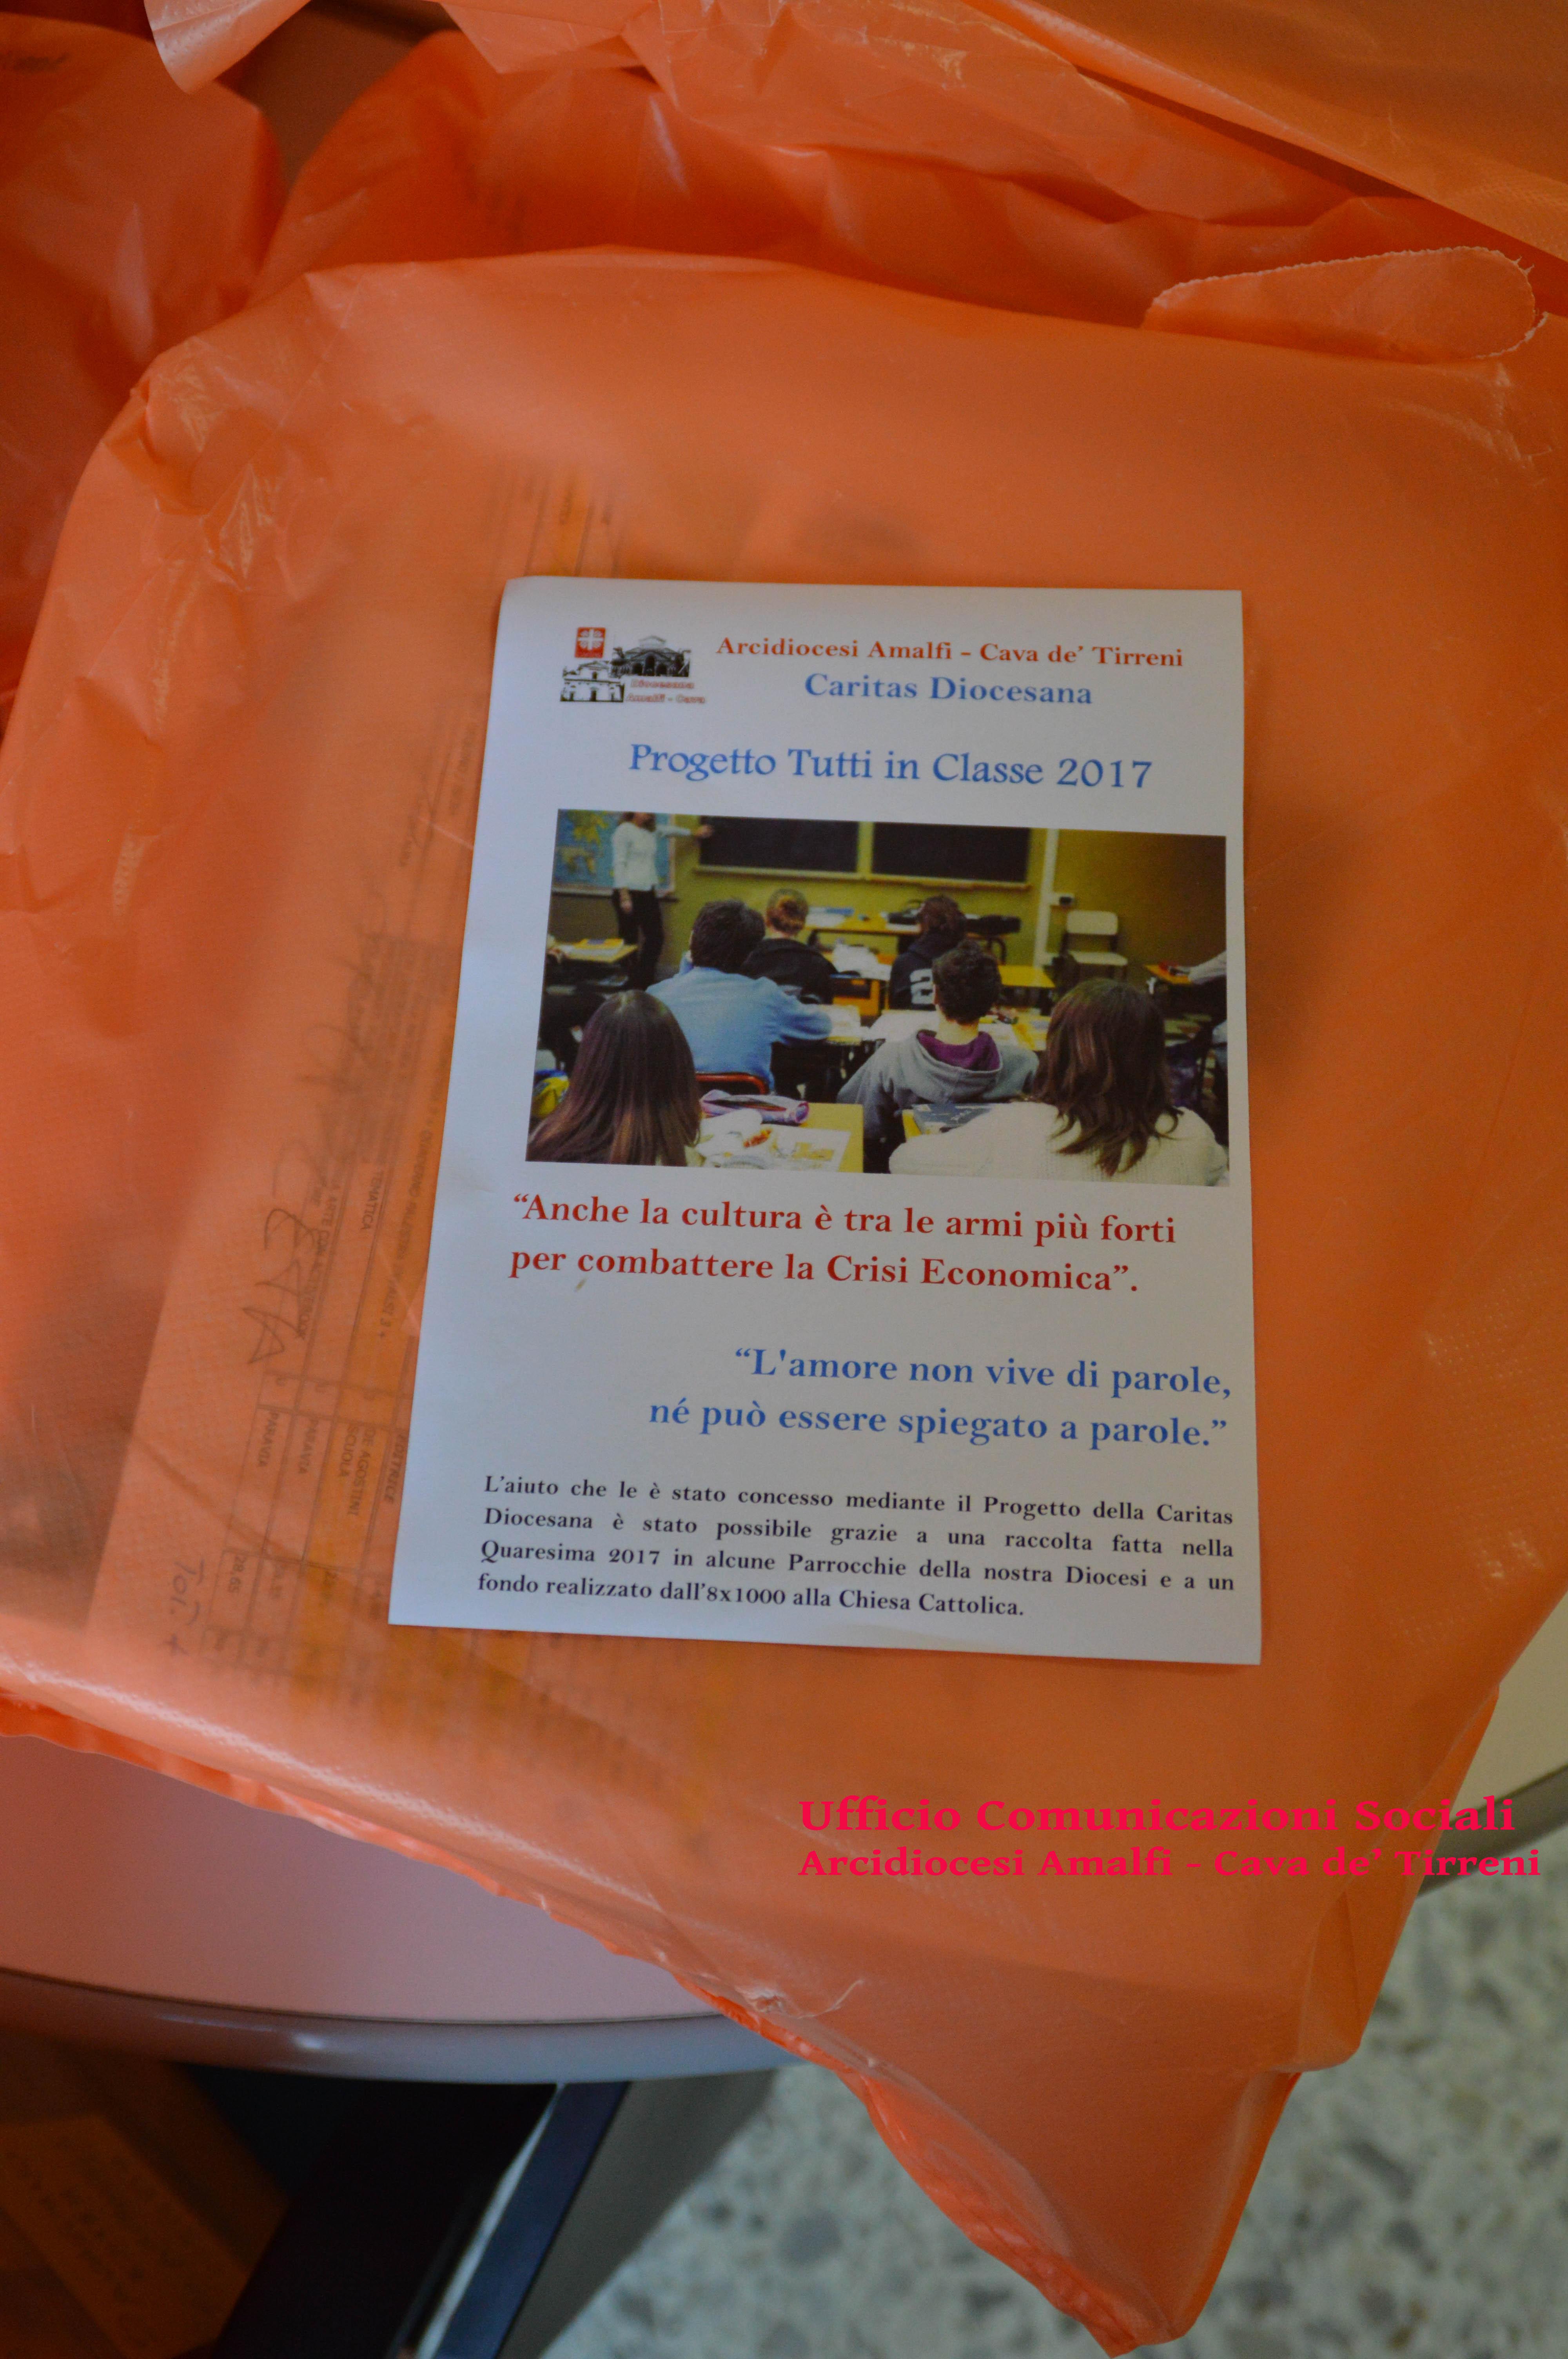 DSC_0007 copy